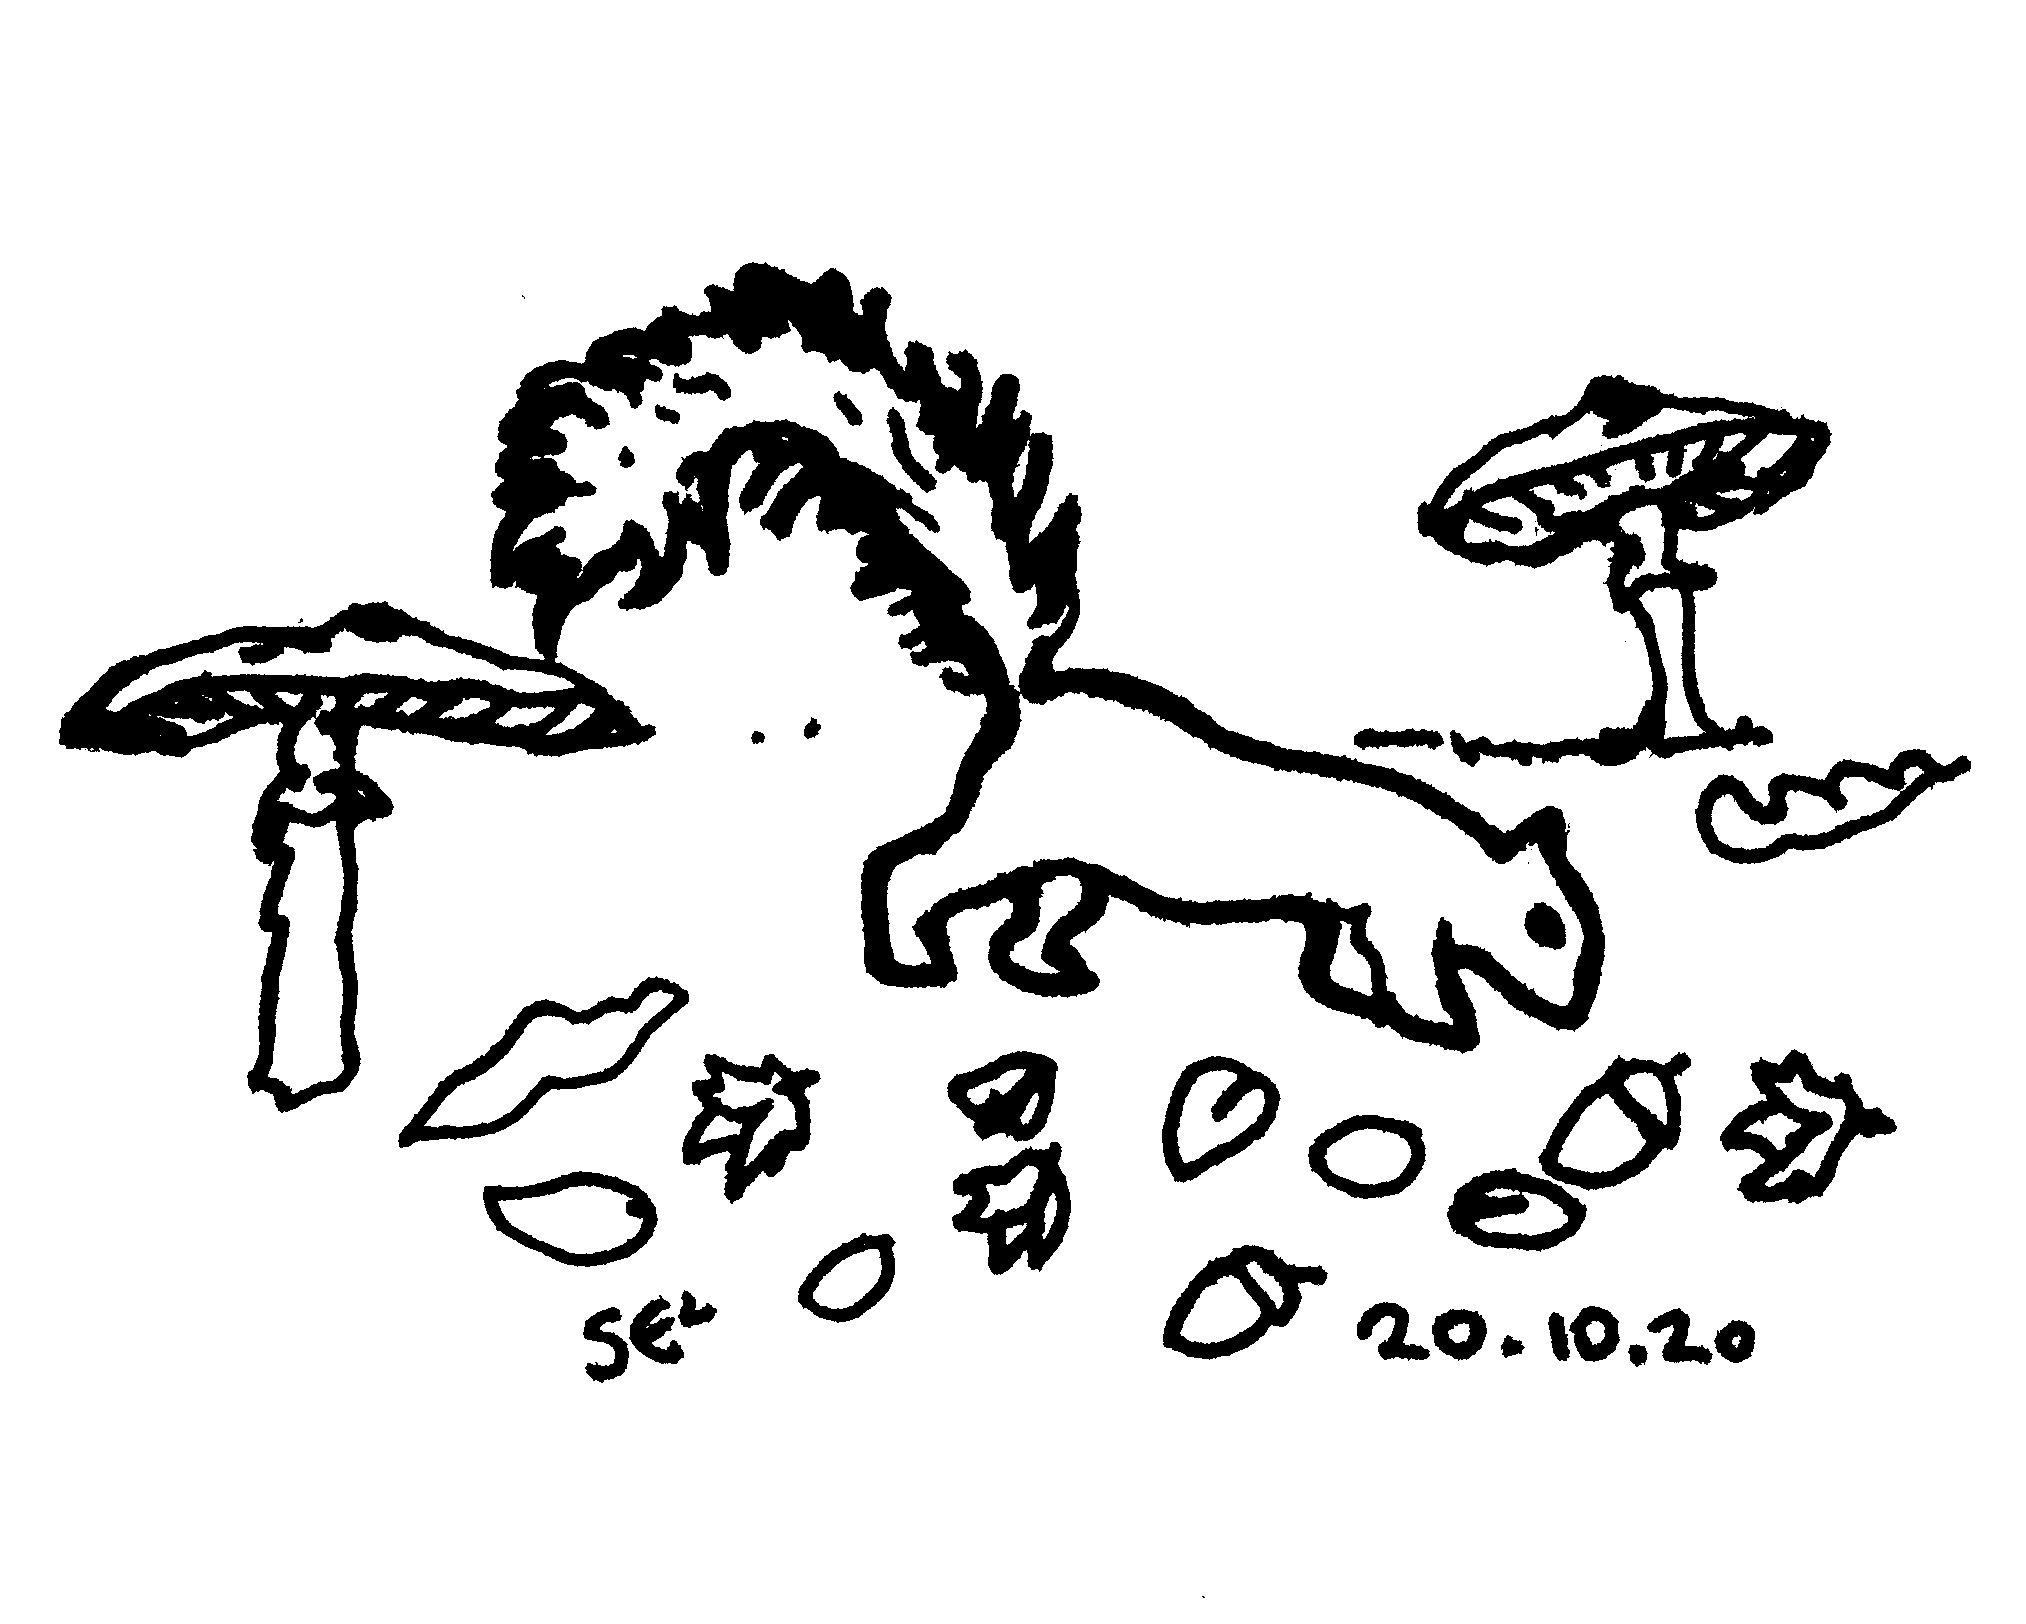 20_10_20040